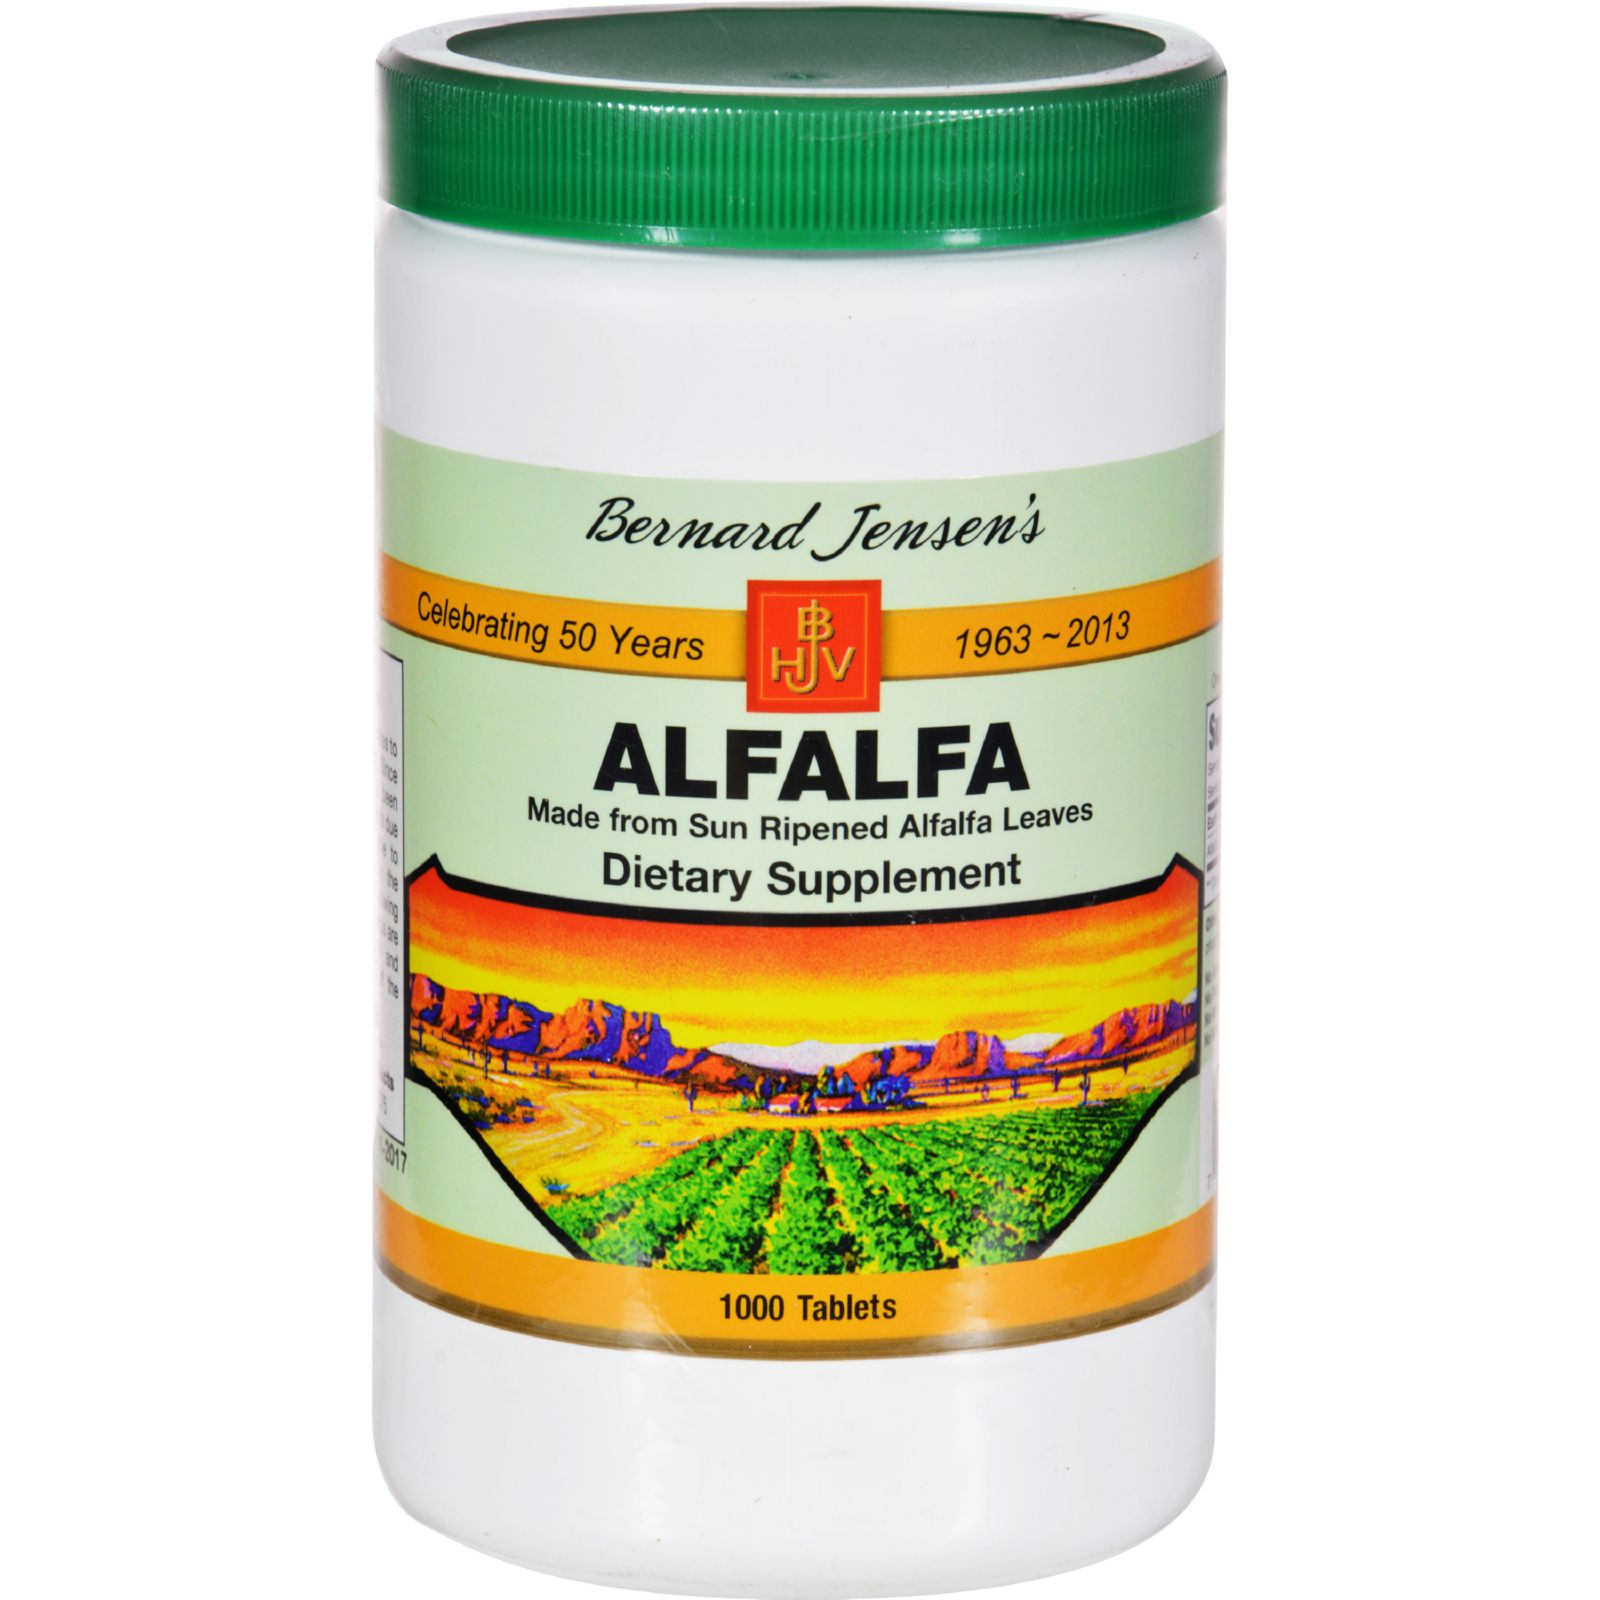 Bernard Jensen Alfalfa Leaf Tablets - 550 mg - 1000 Tablets